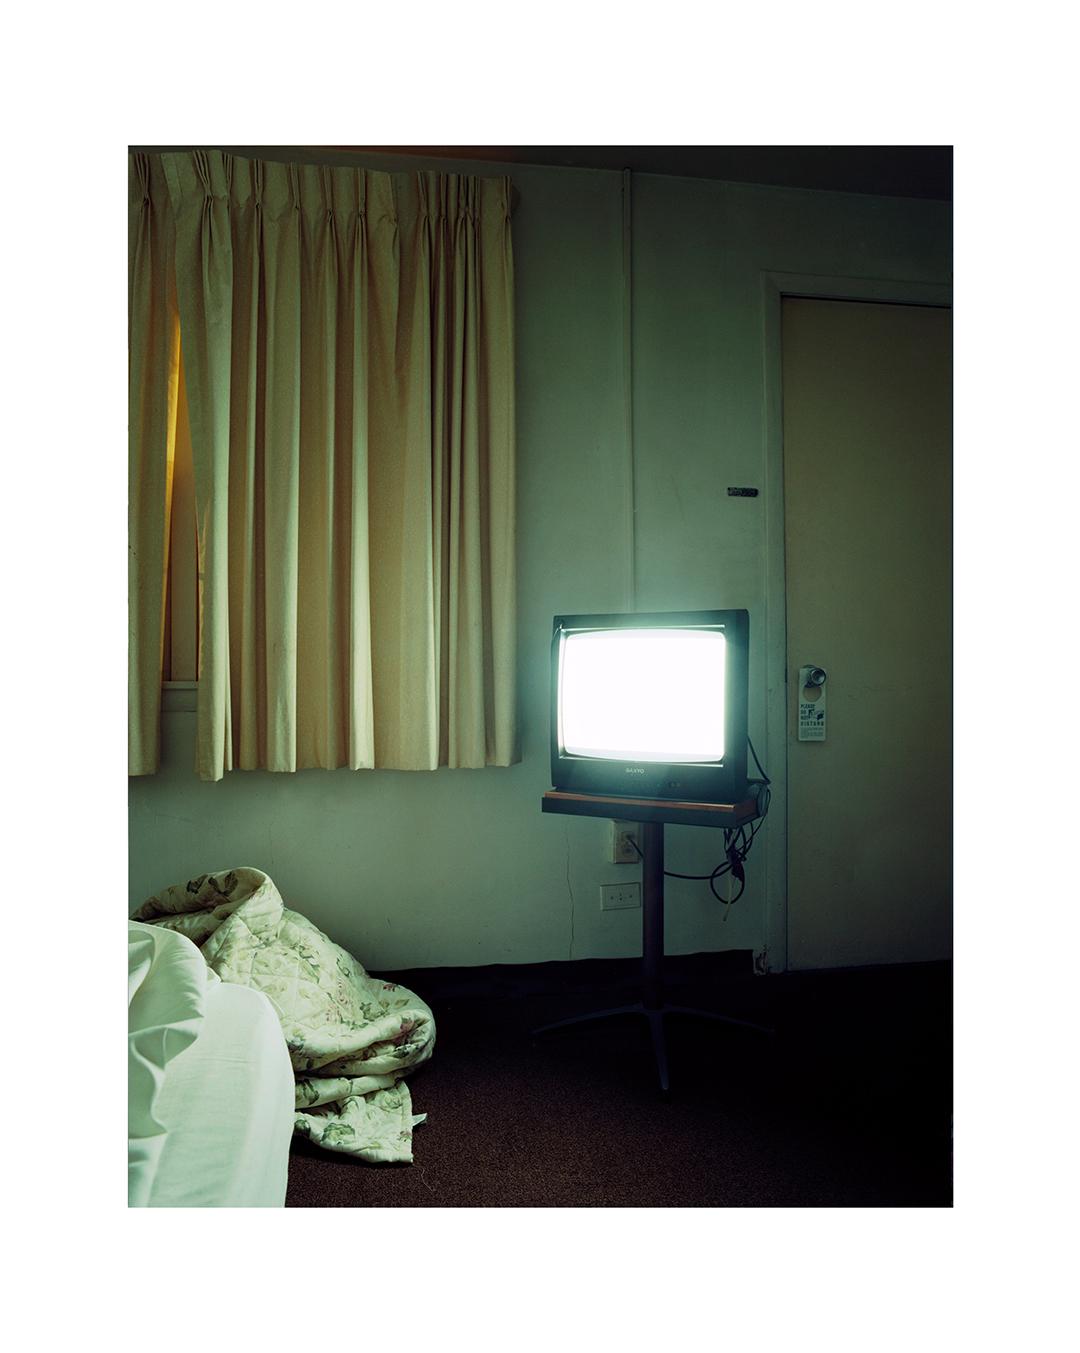 tv_34.jpg